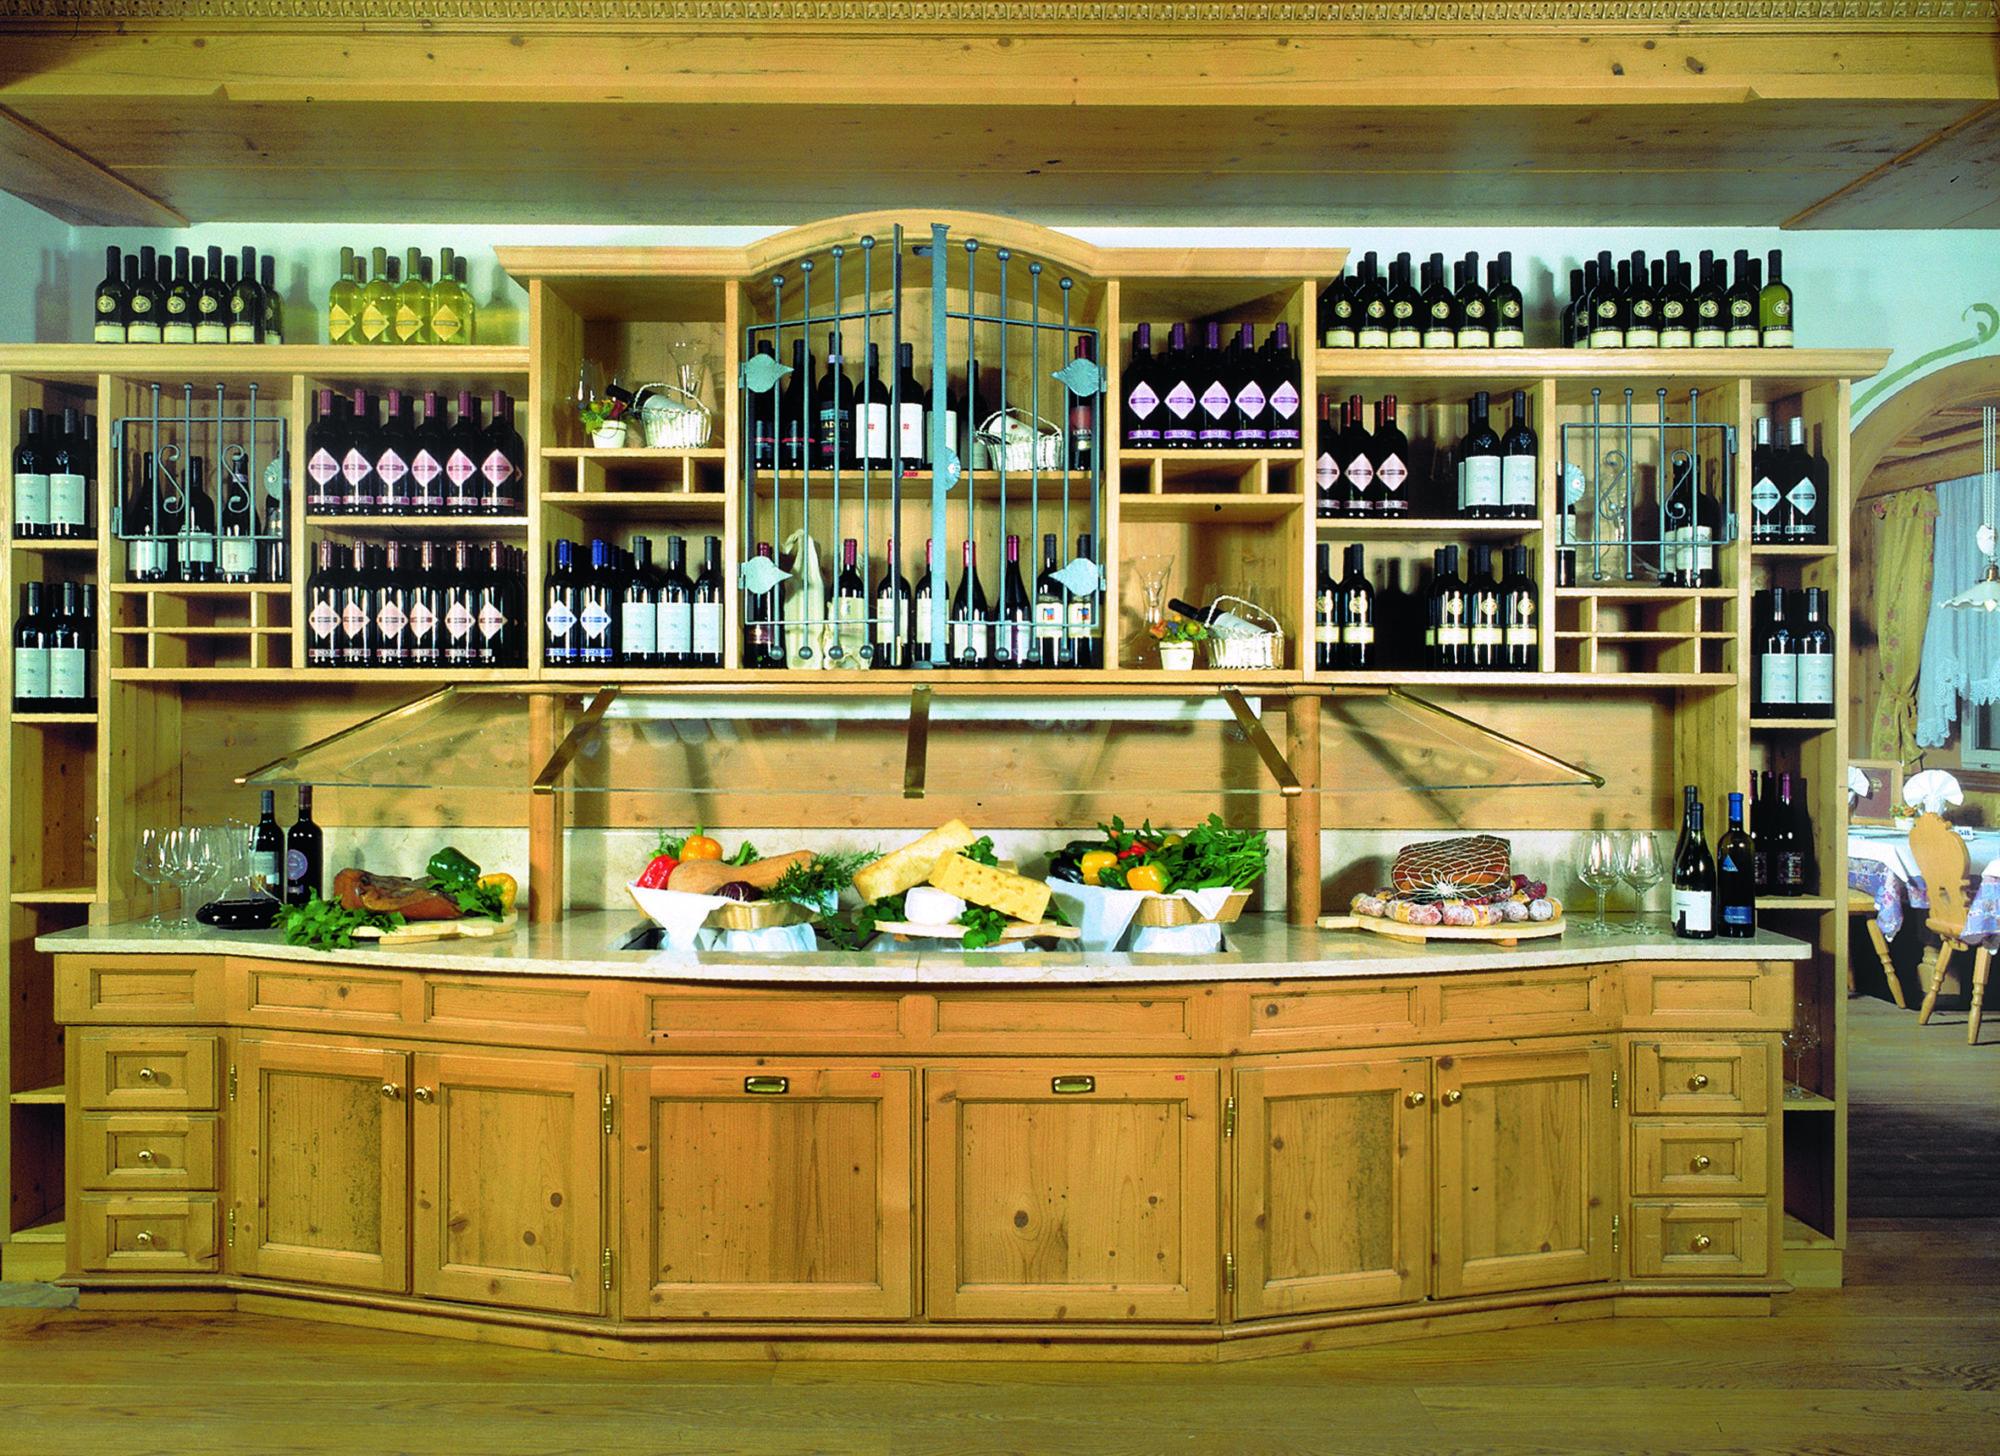 8 Hotel Soreghes - buffet